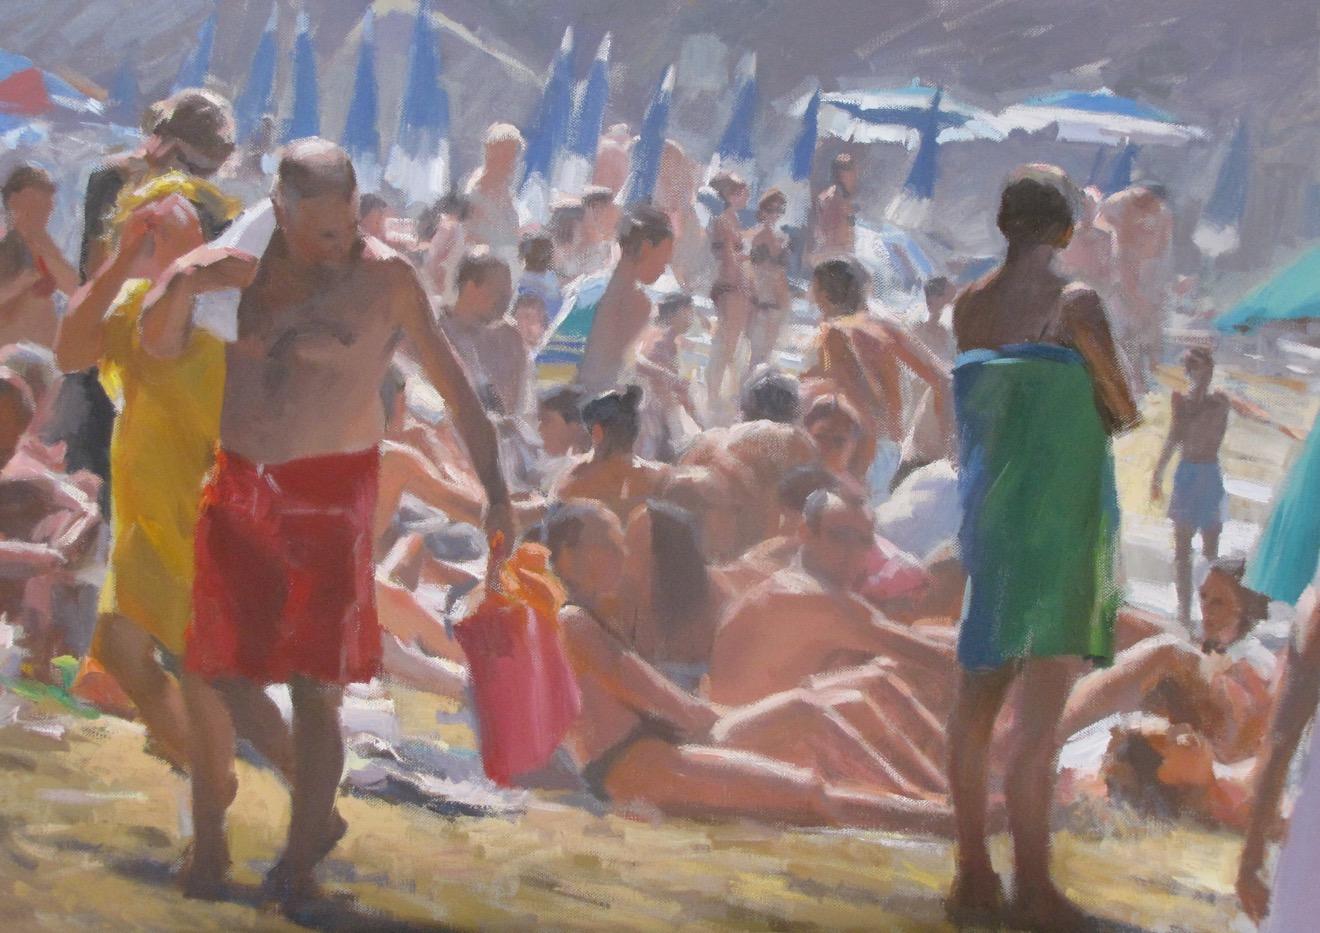 01358 Bagnanti, di Andrea Mancini. Olio su tela, cm 50x70